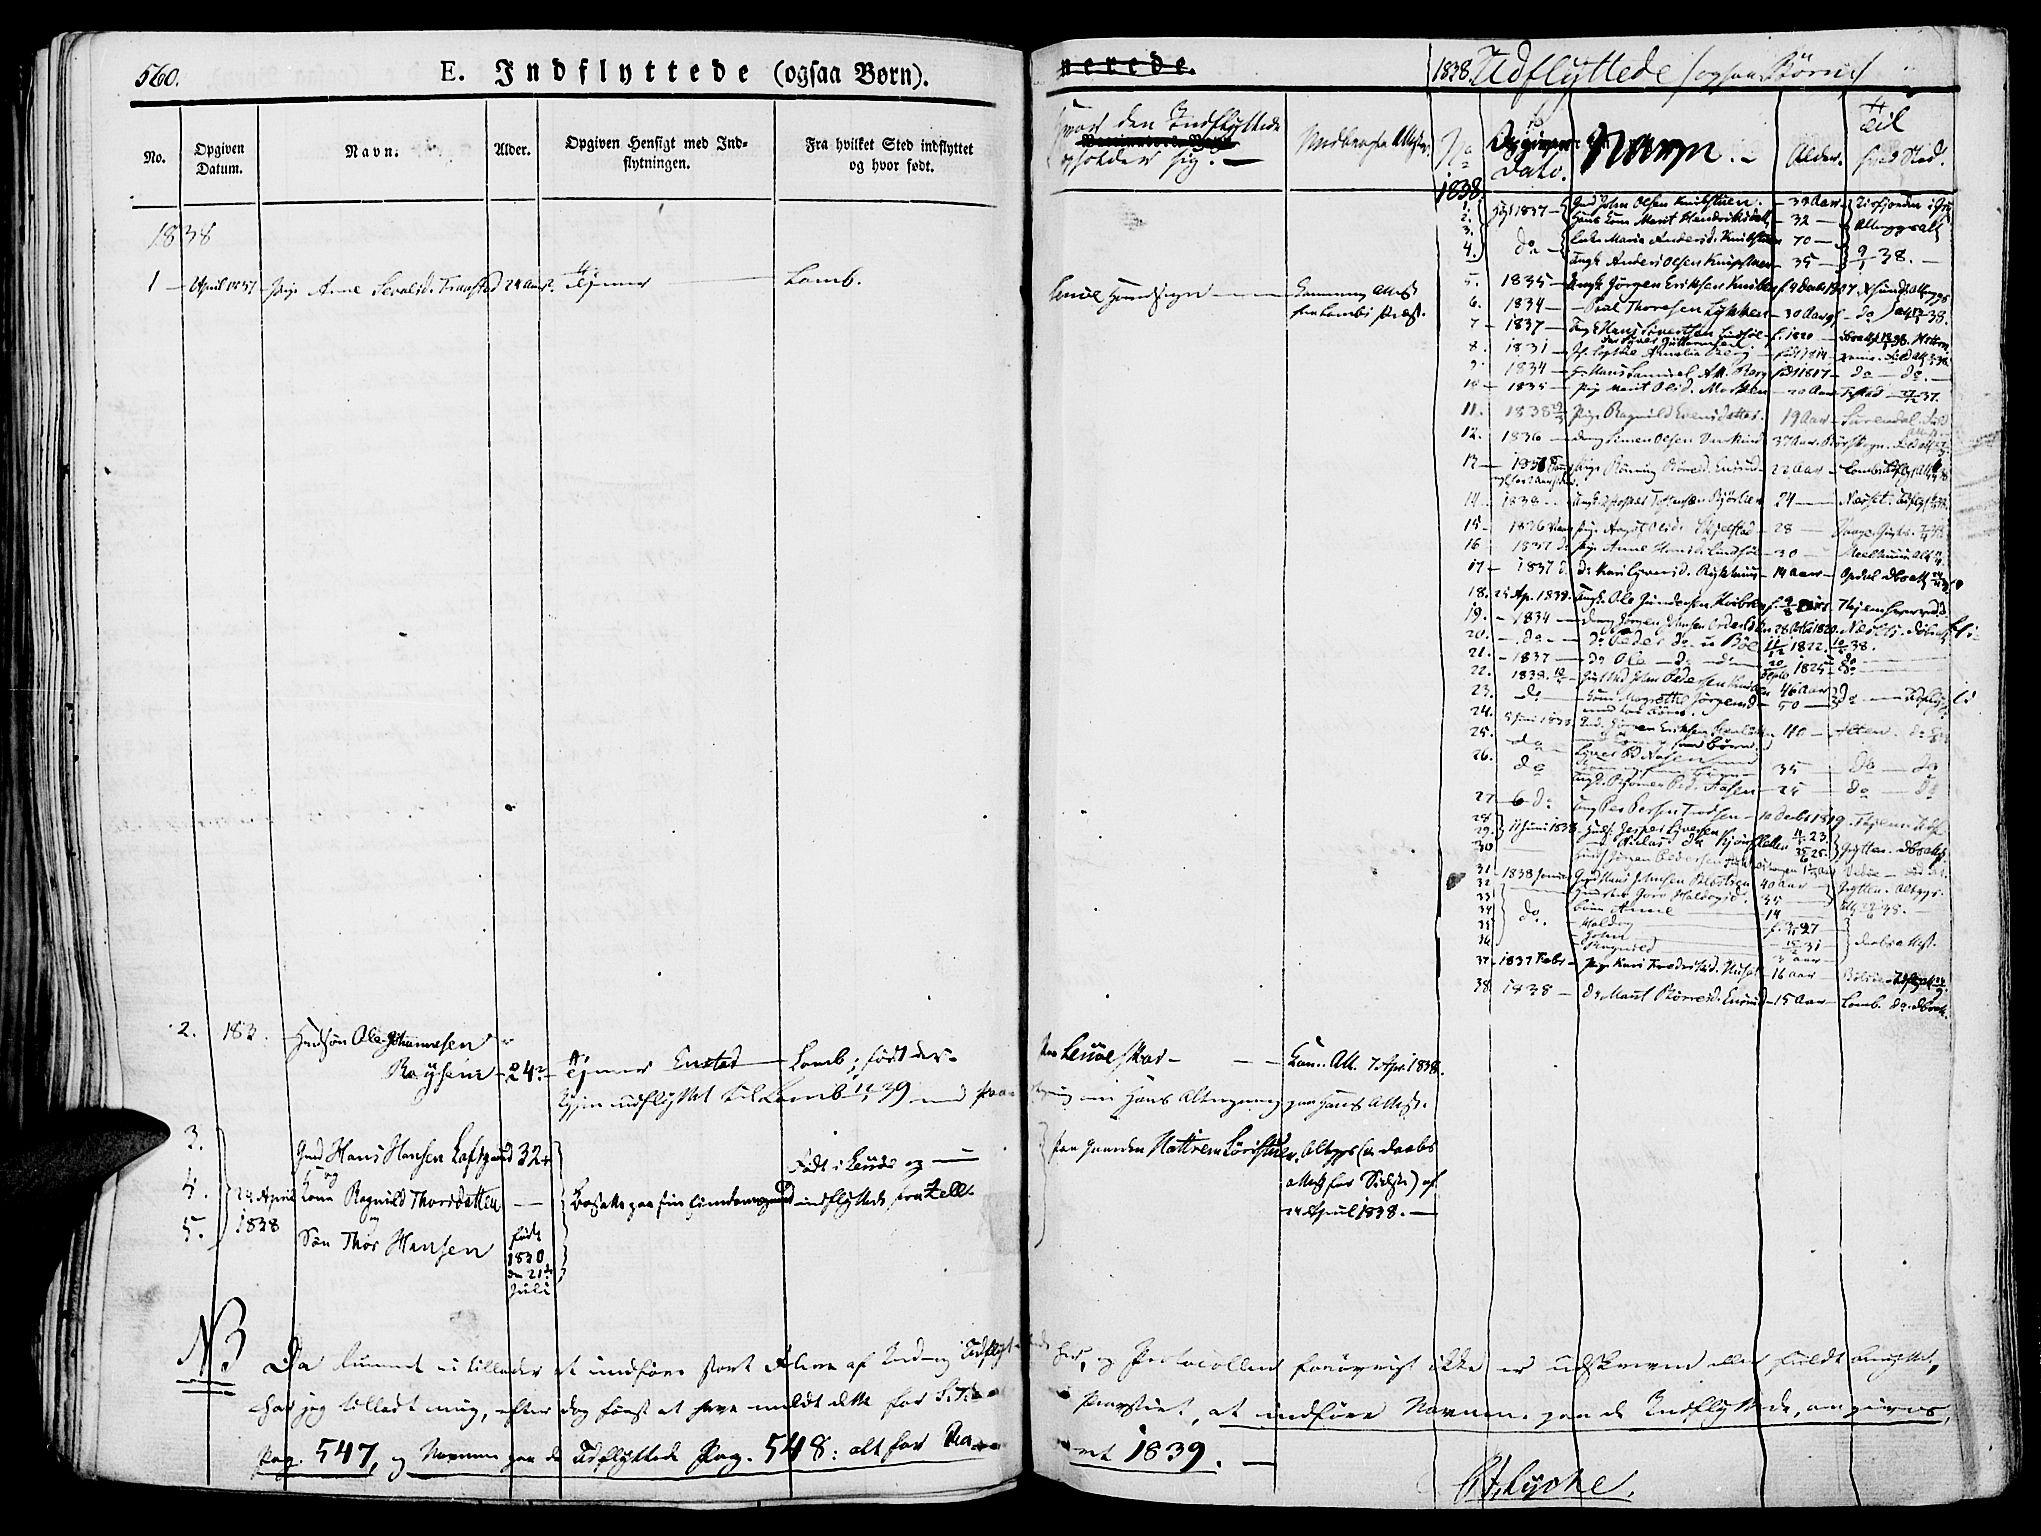 SAH, Lesja prestekontor, Ministerialbok nr. 5, 1830-1842, s. 560